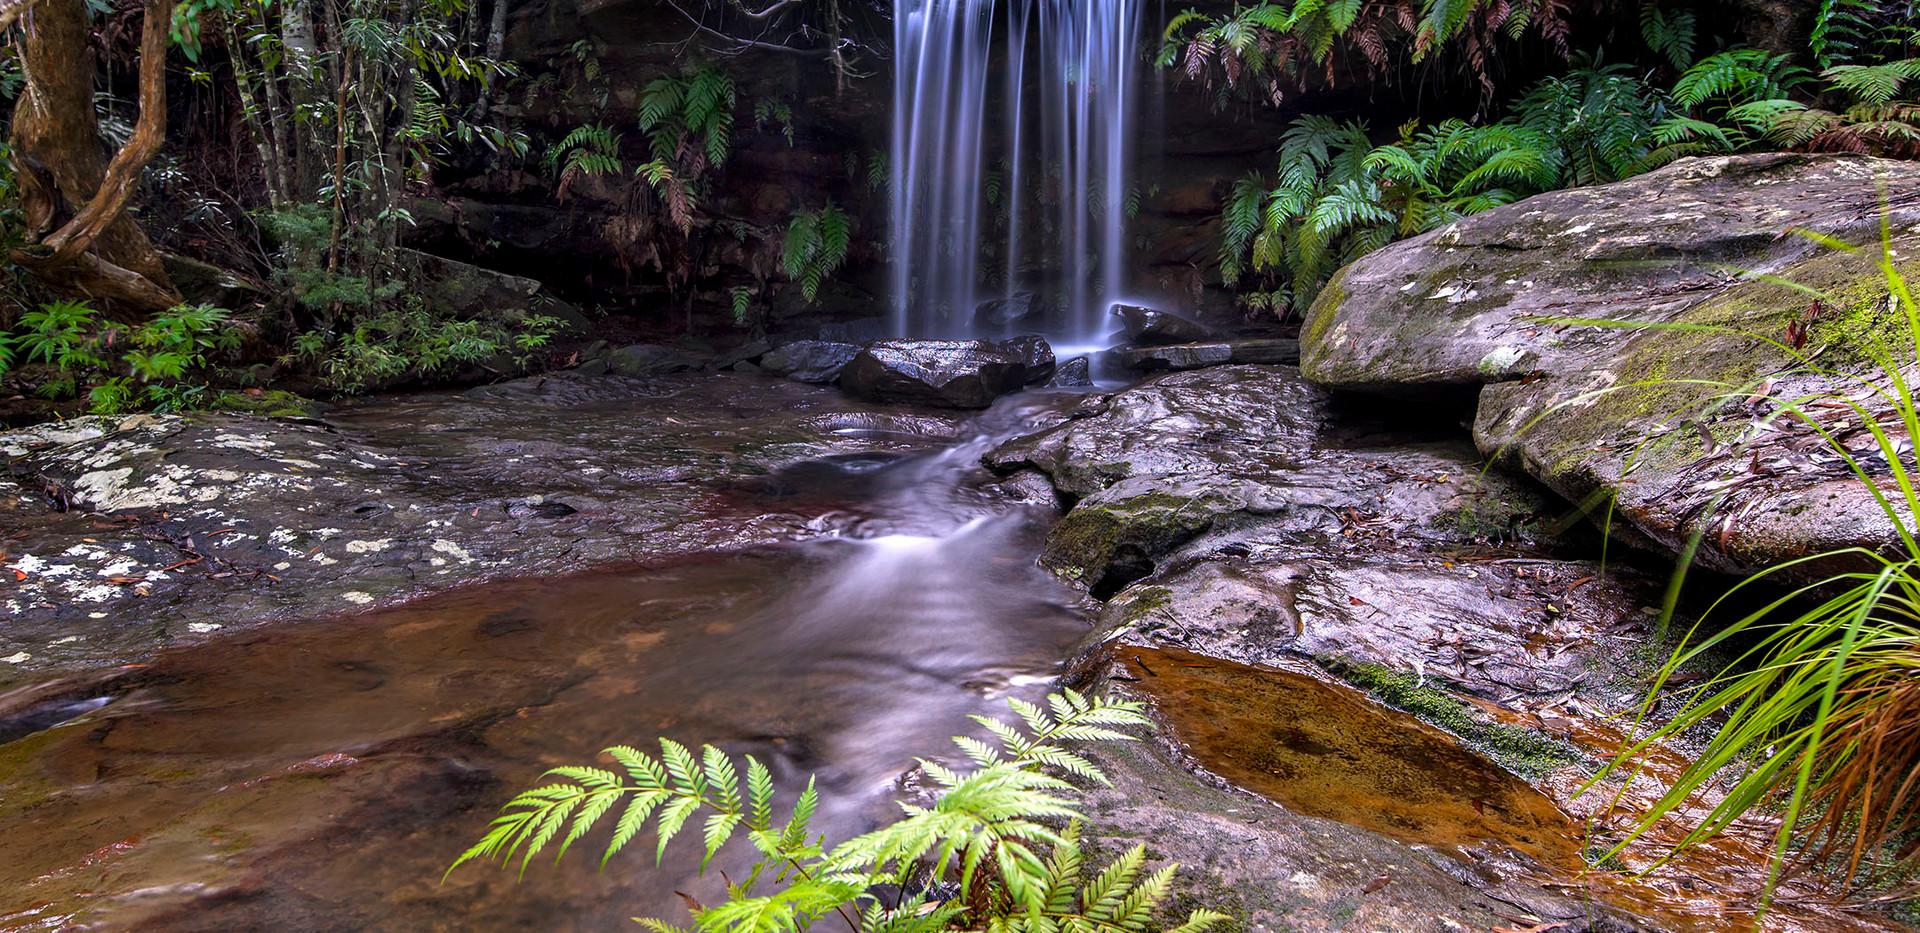 Girrakool Waterfall